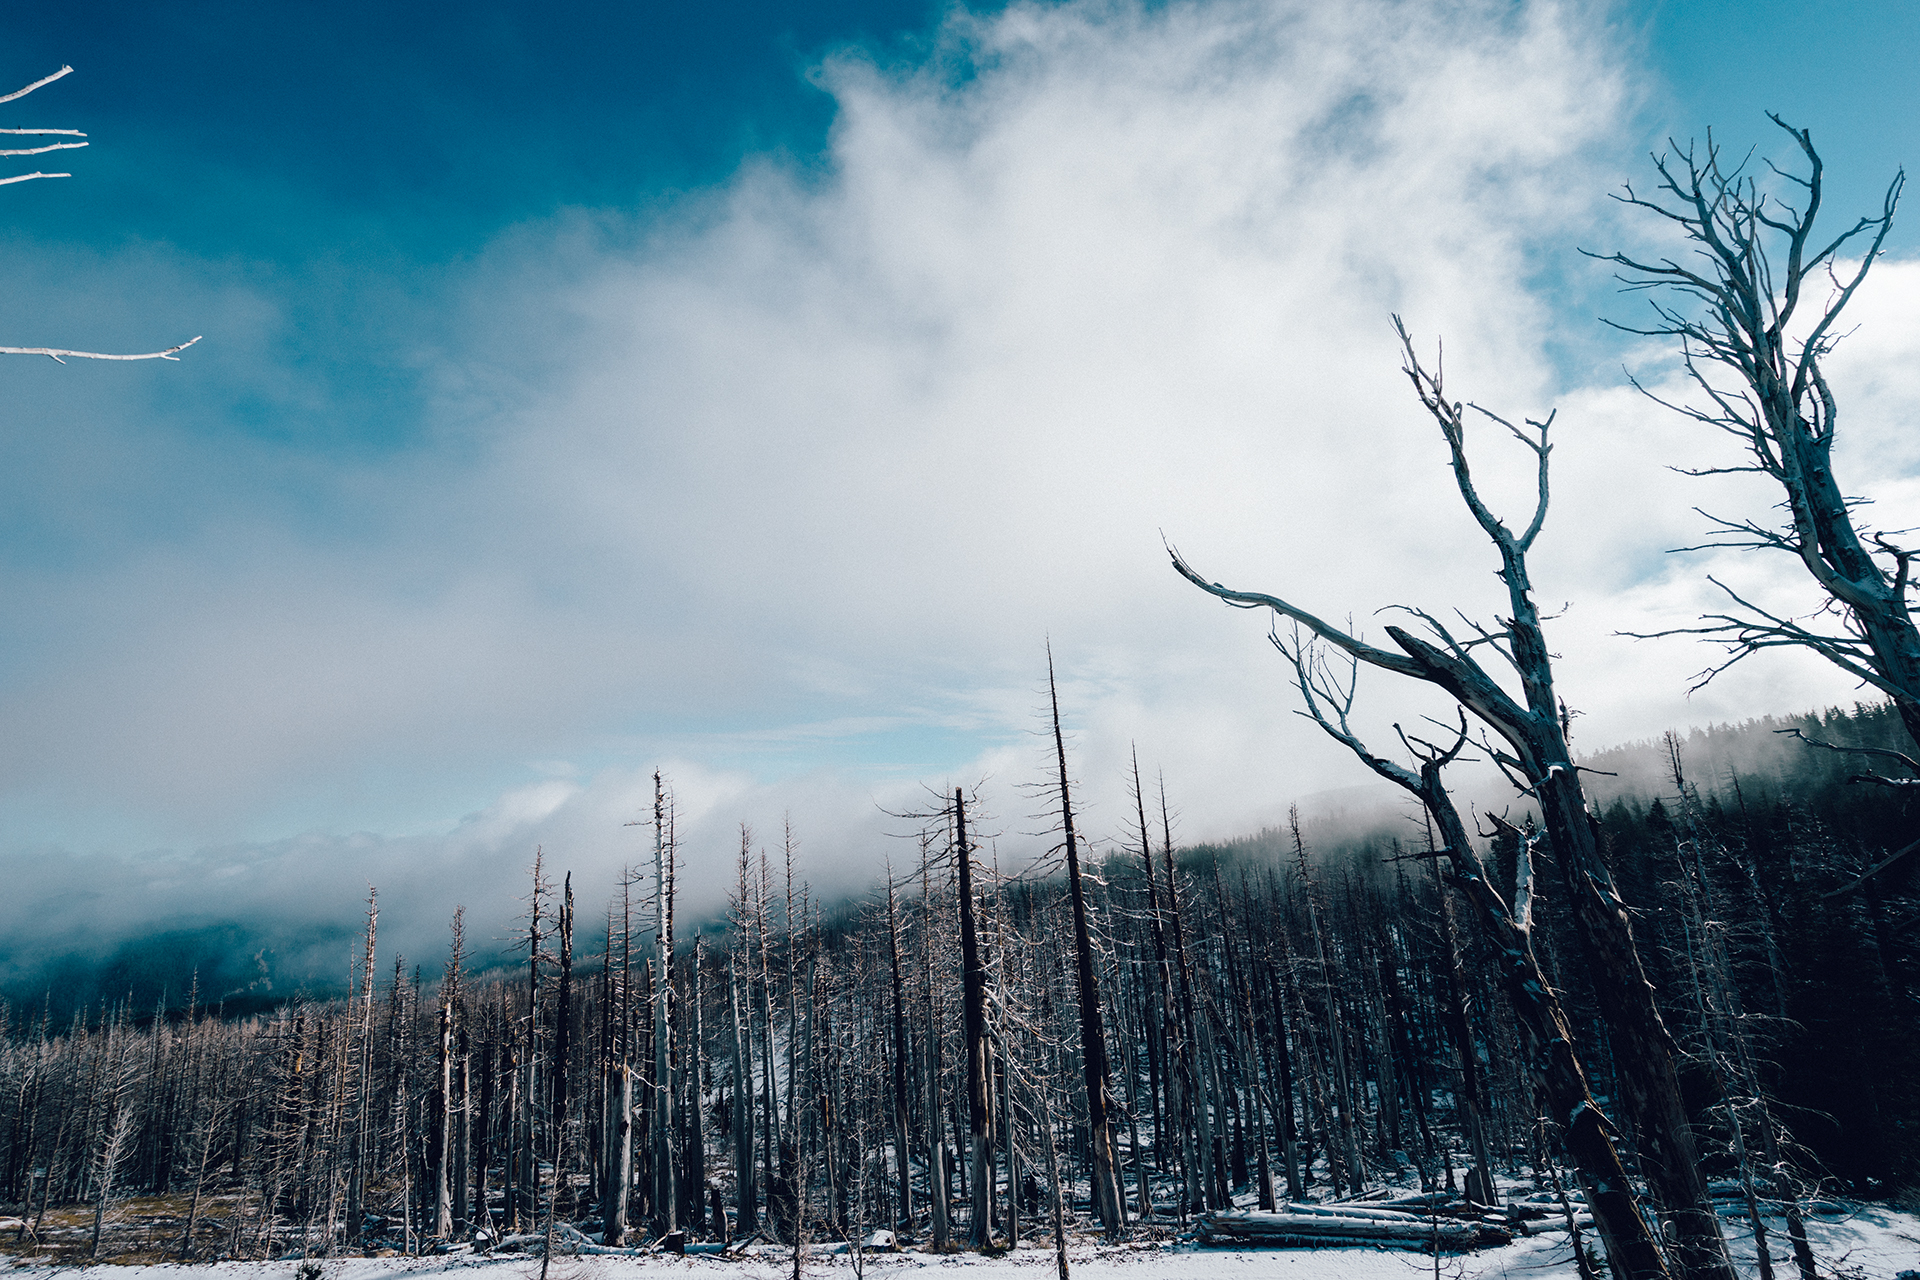 Inspiration of success mindset – winter forest